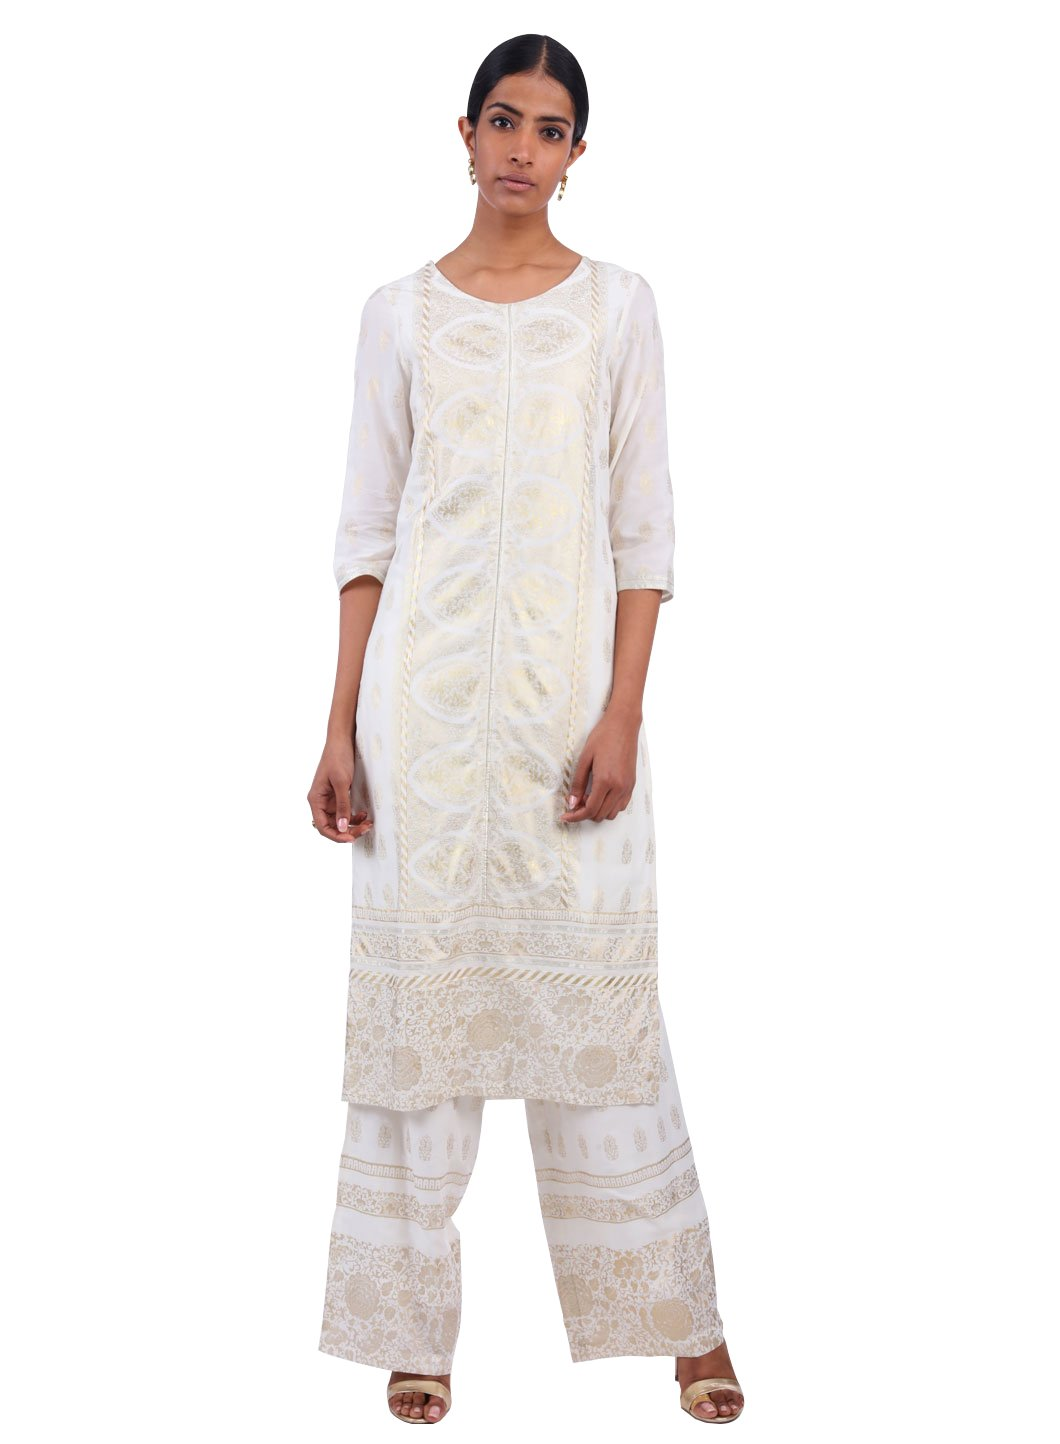 W for Woman Light Occasionwear Kurta White